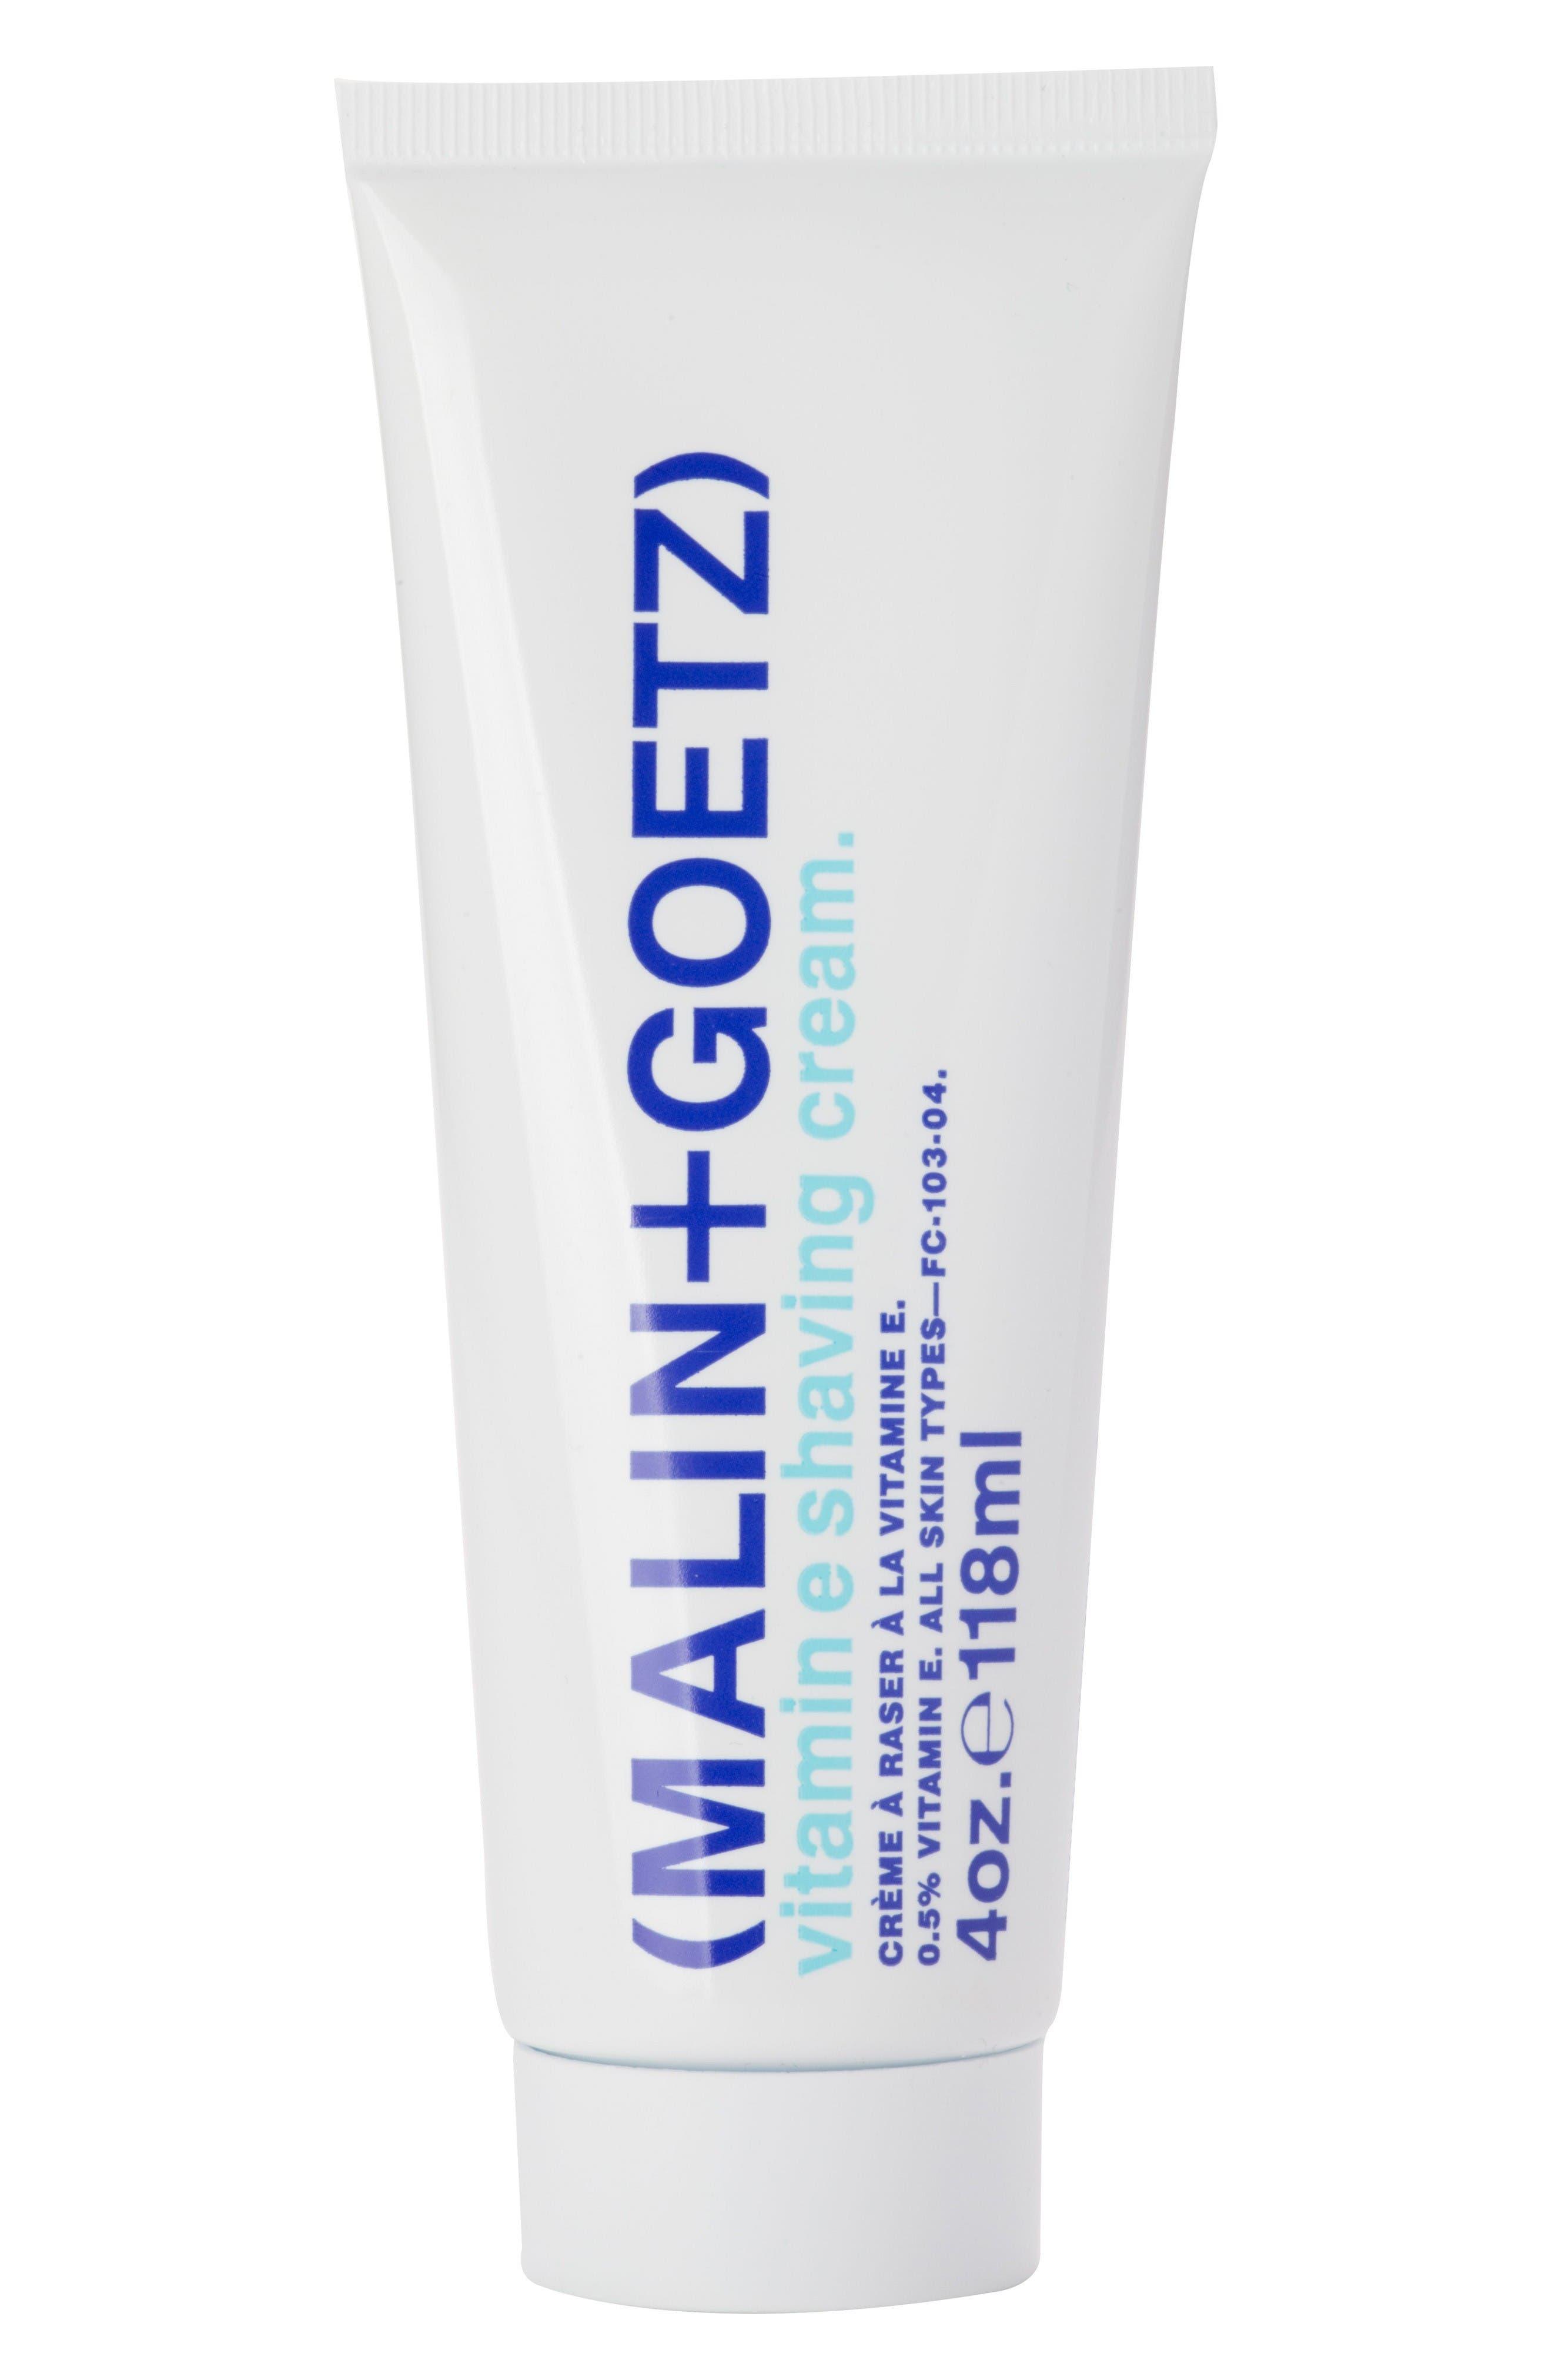 Main Image - MALIN+GOETZ Vitamin E Shaving Cream